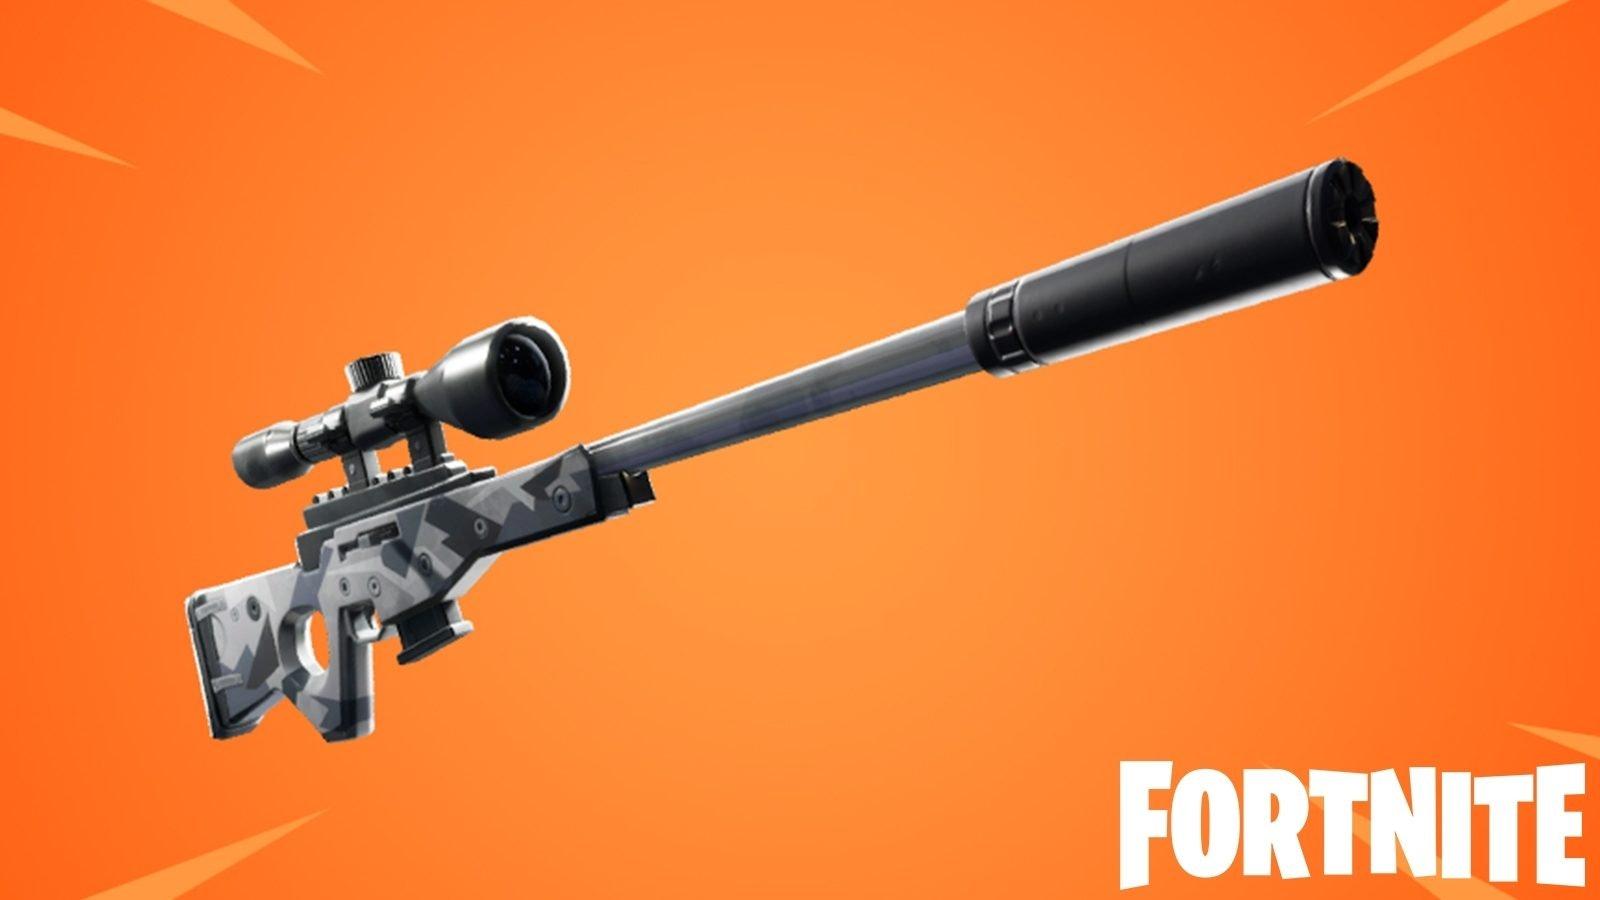 Fortnite Suppressed Sniper Rifle